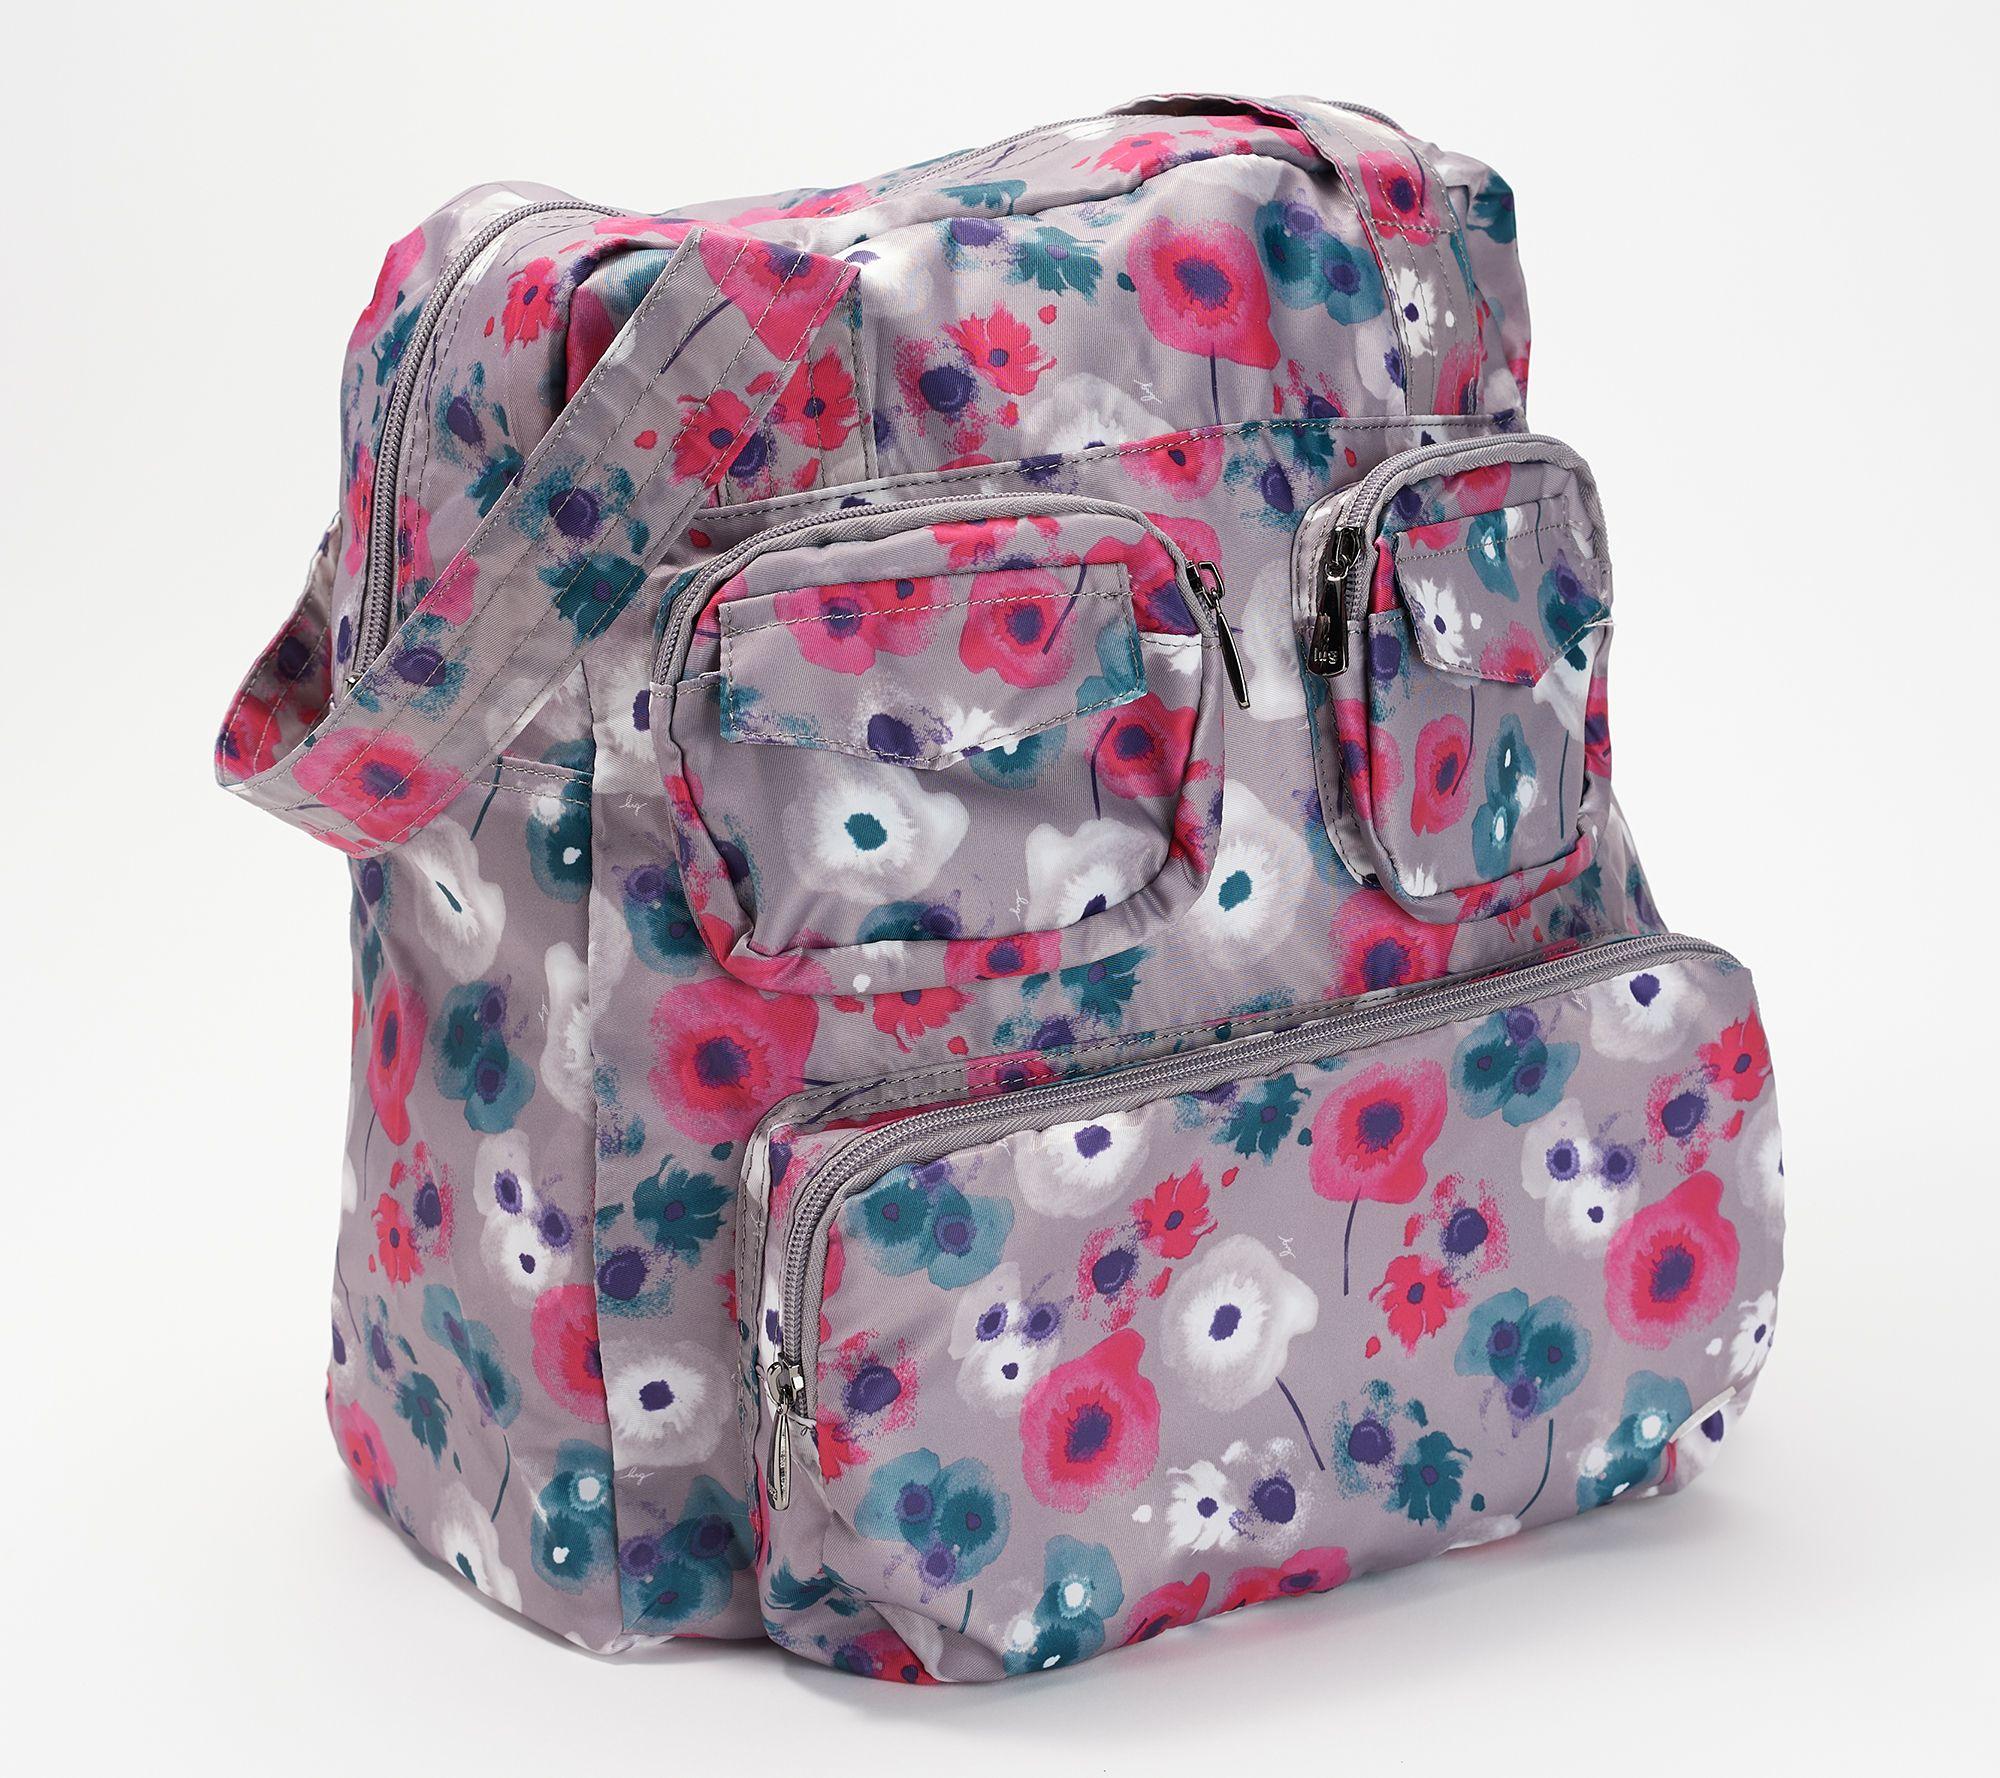 transparent dolce handbags jaguar s women bags gabbana handbag rubber semi en sicily